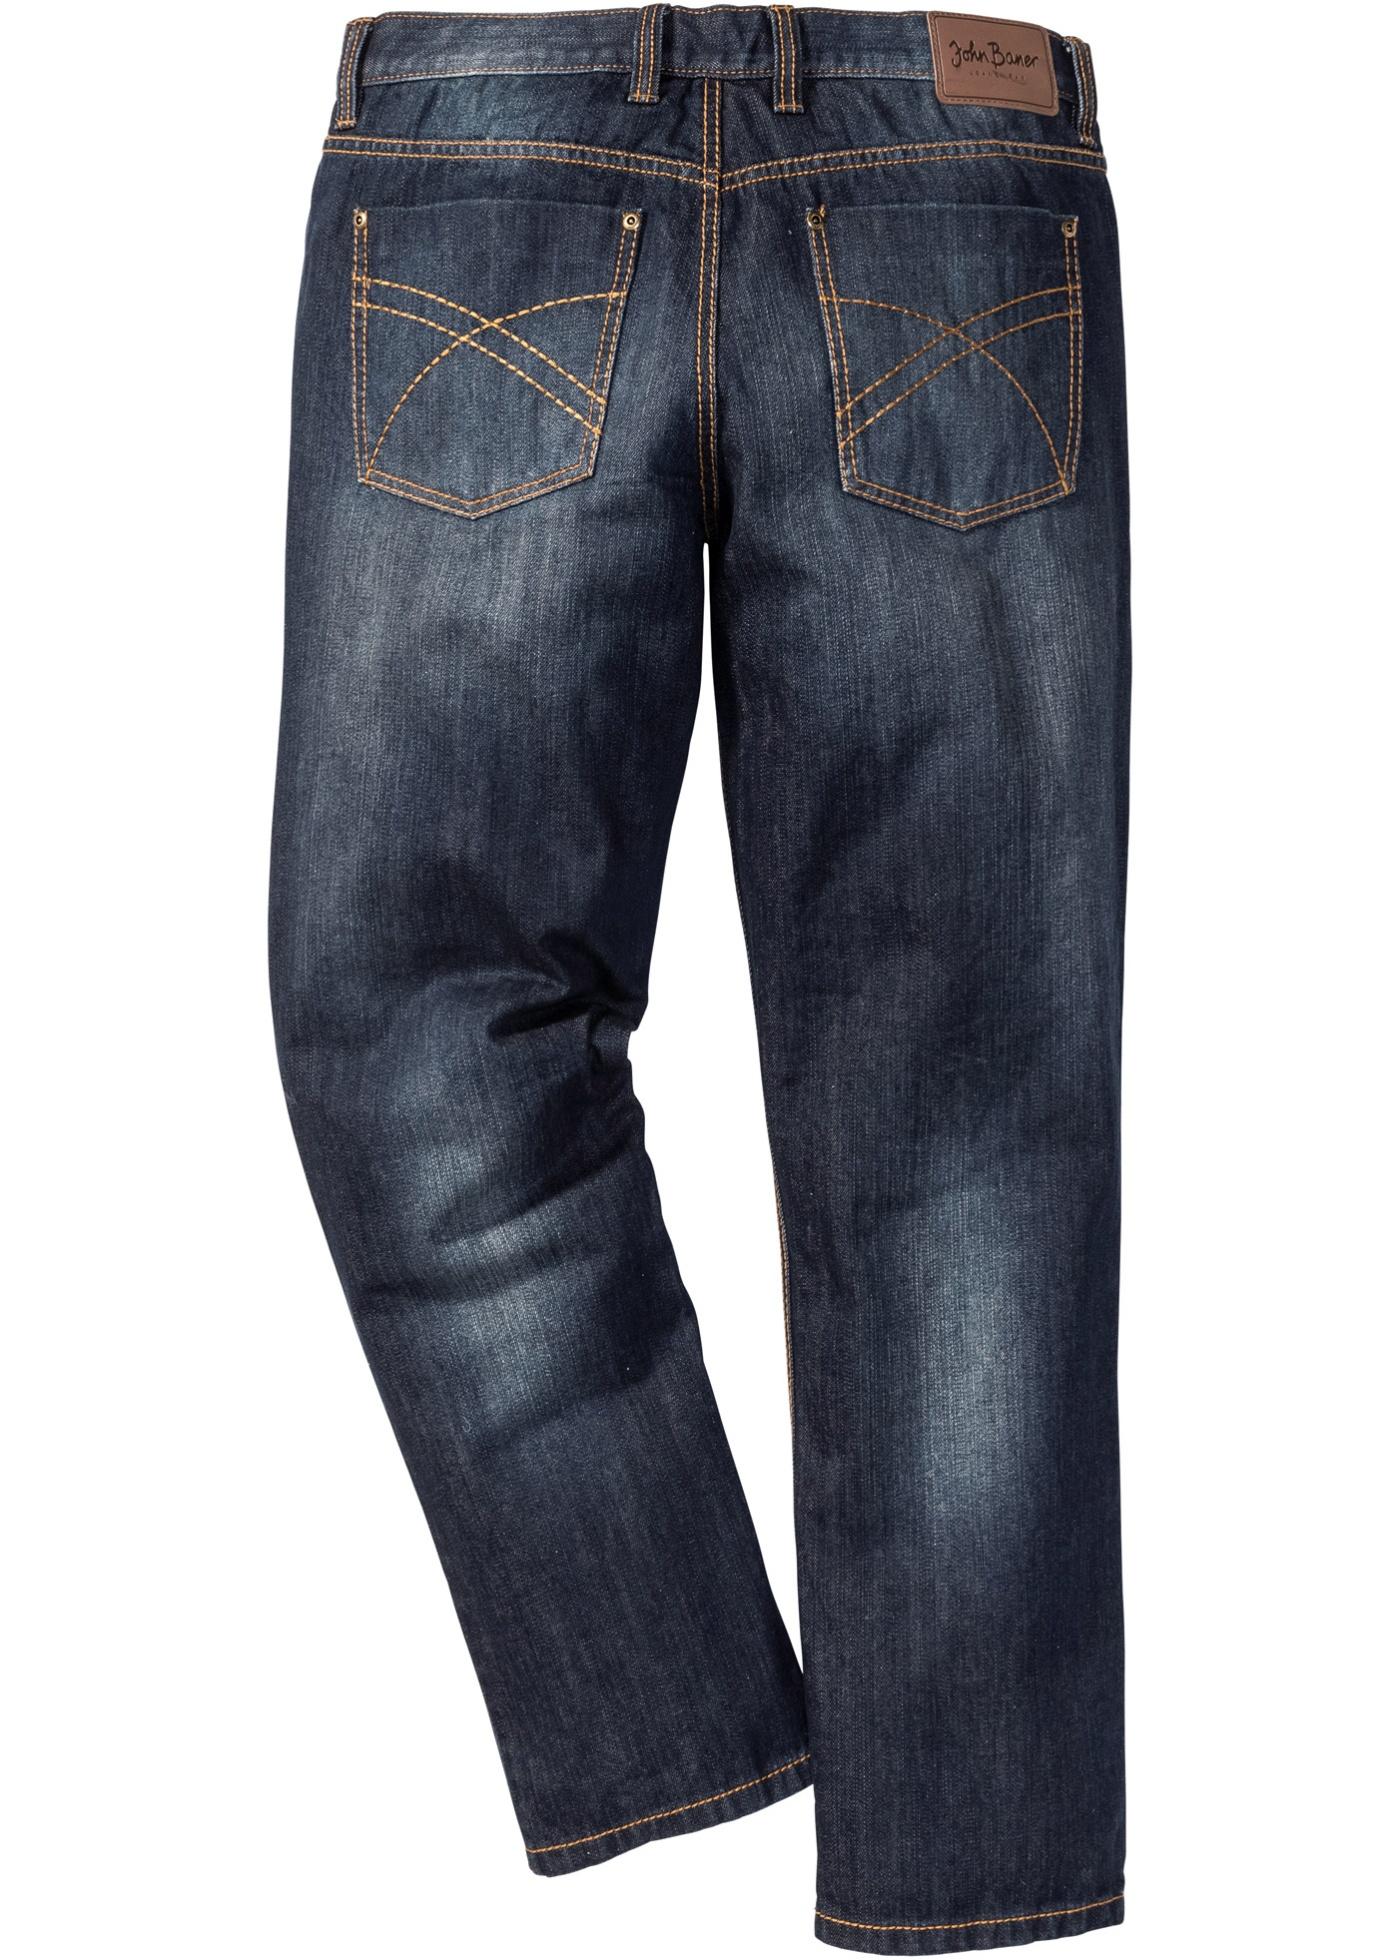 Bonprix - Jeans 299.00